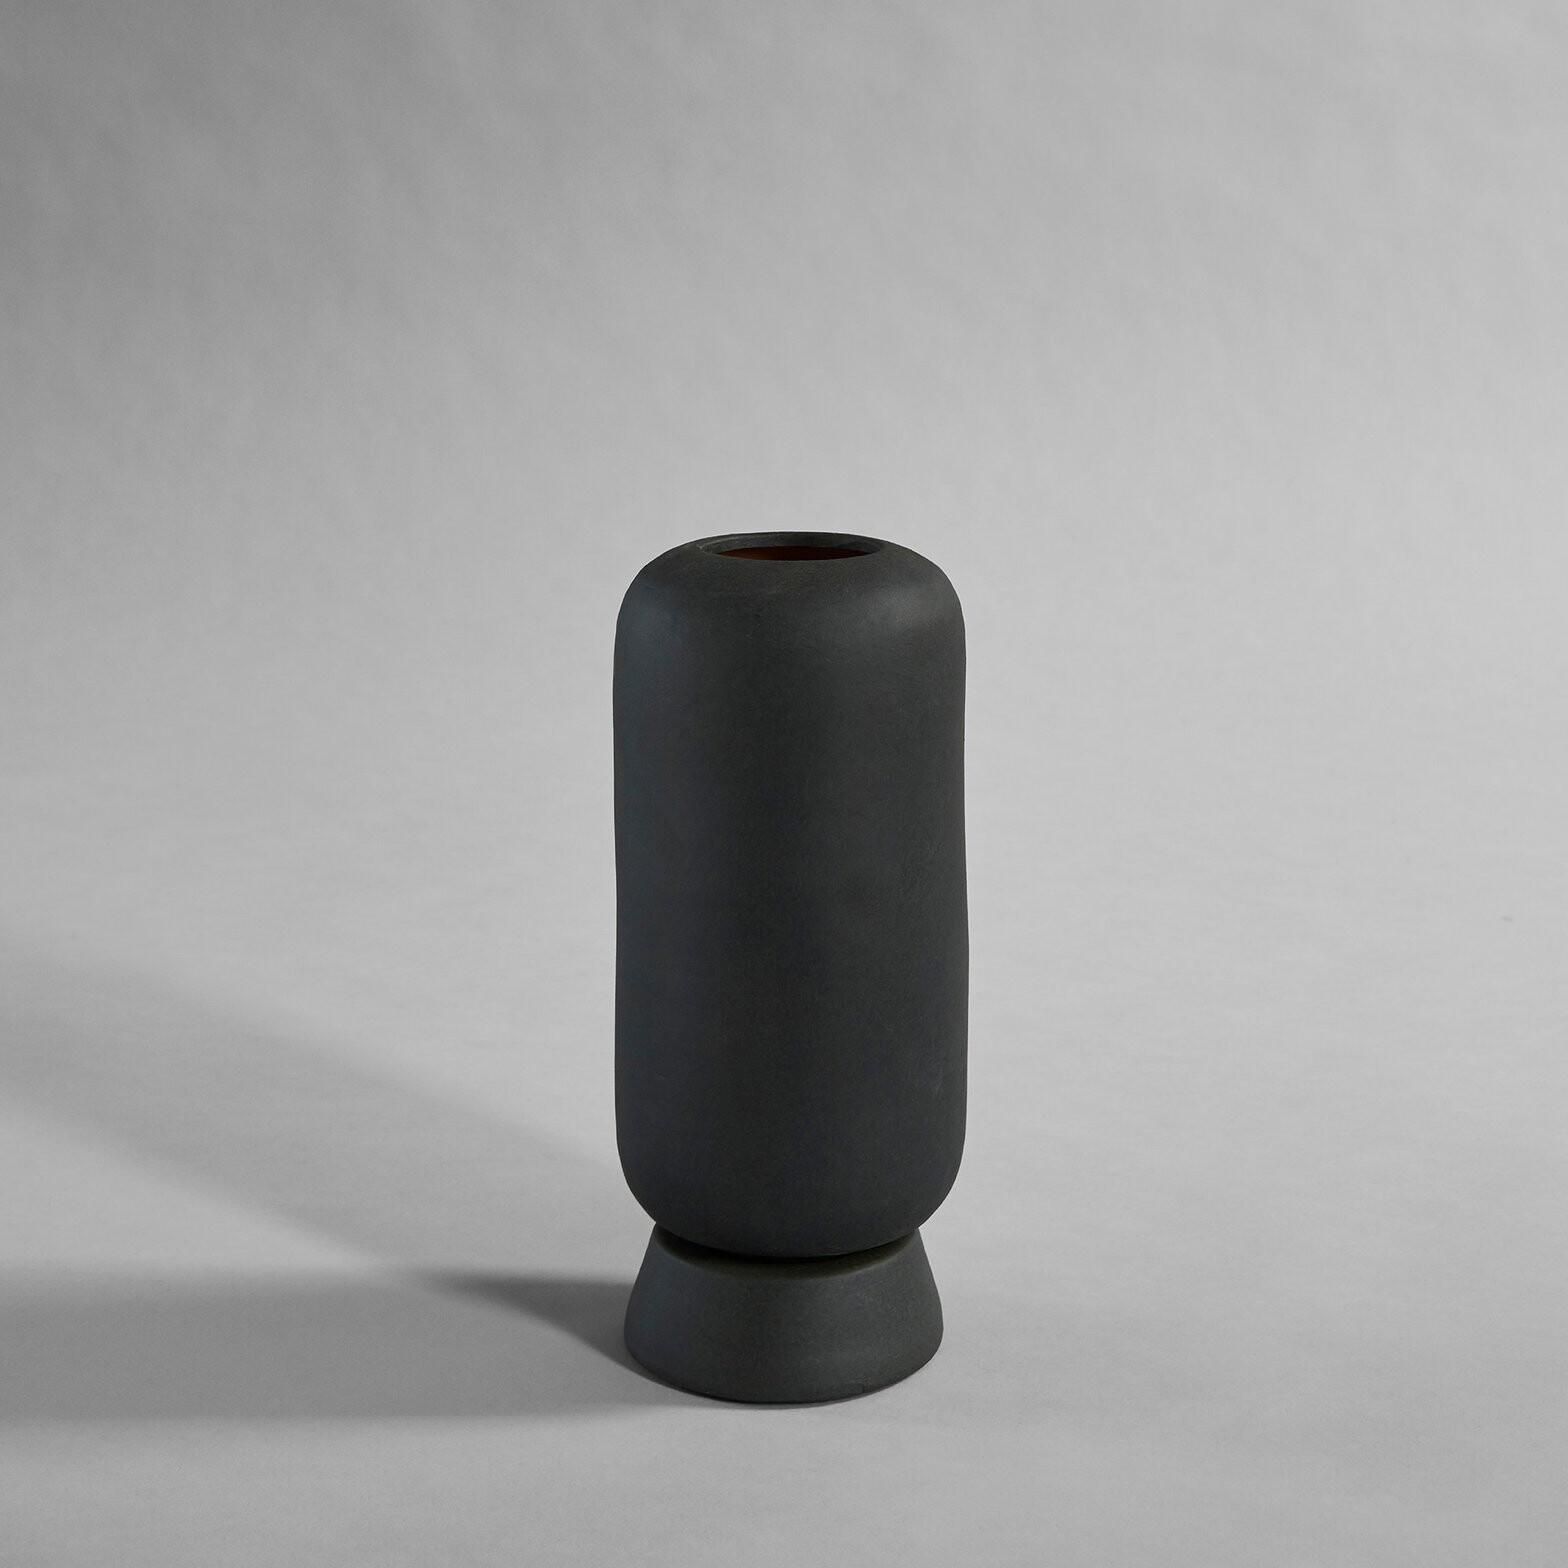 Kabin+Vase%2C+Small+-+Black